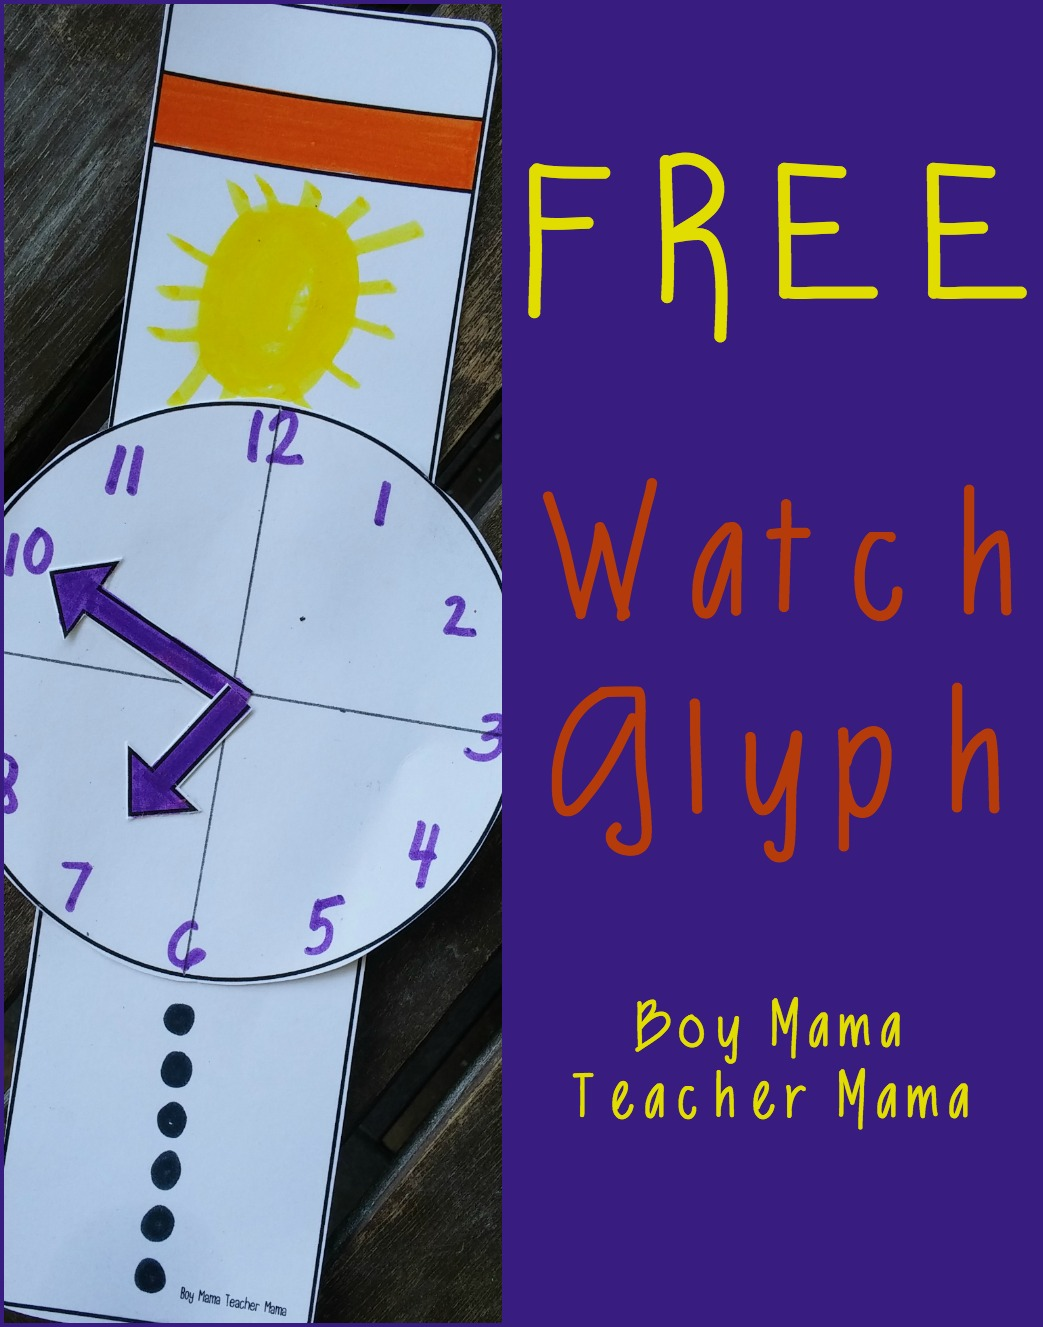 Boy Mama Teacher Mama FREE Watch Glyph (featured)